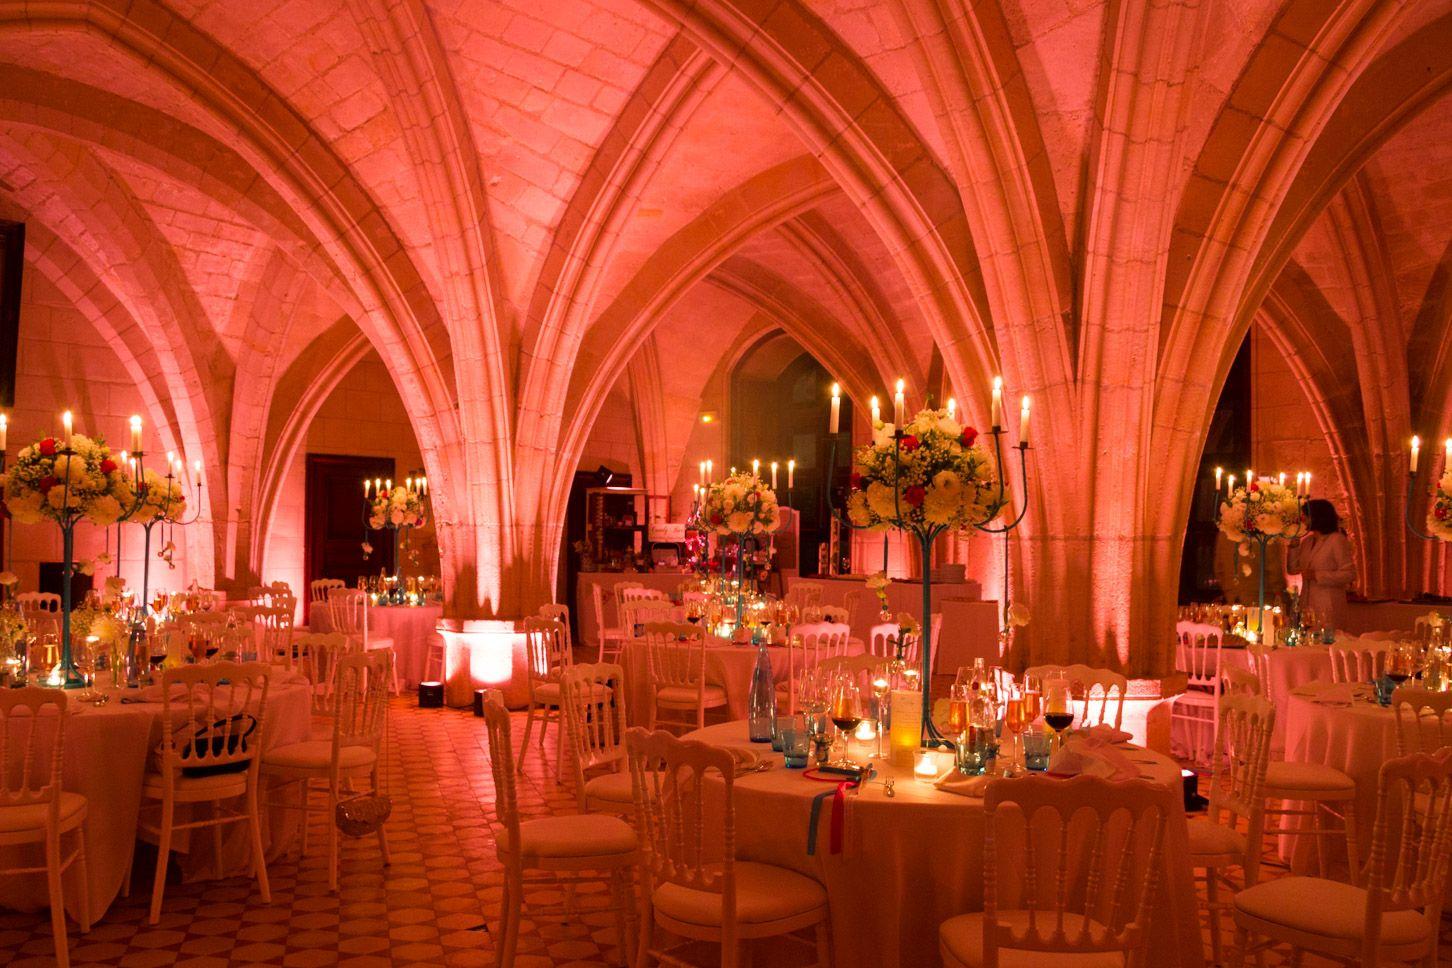 Eclairage mariage à l'Abbaye de Longpont